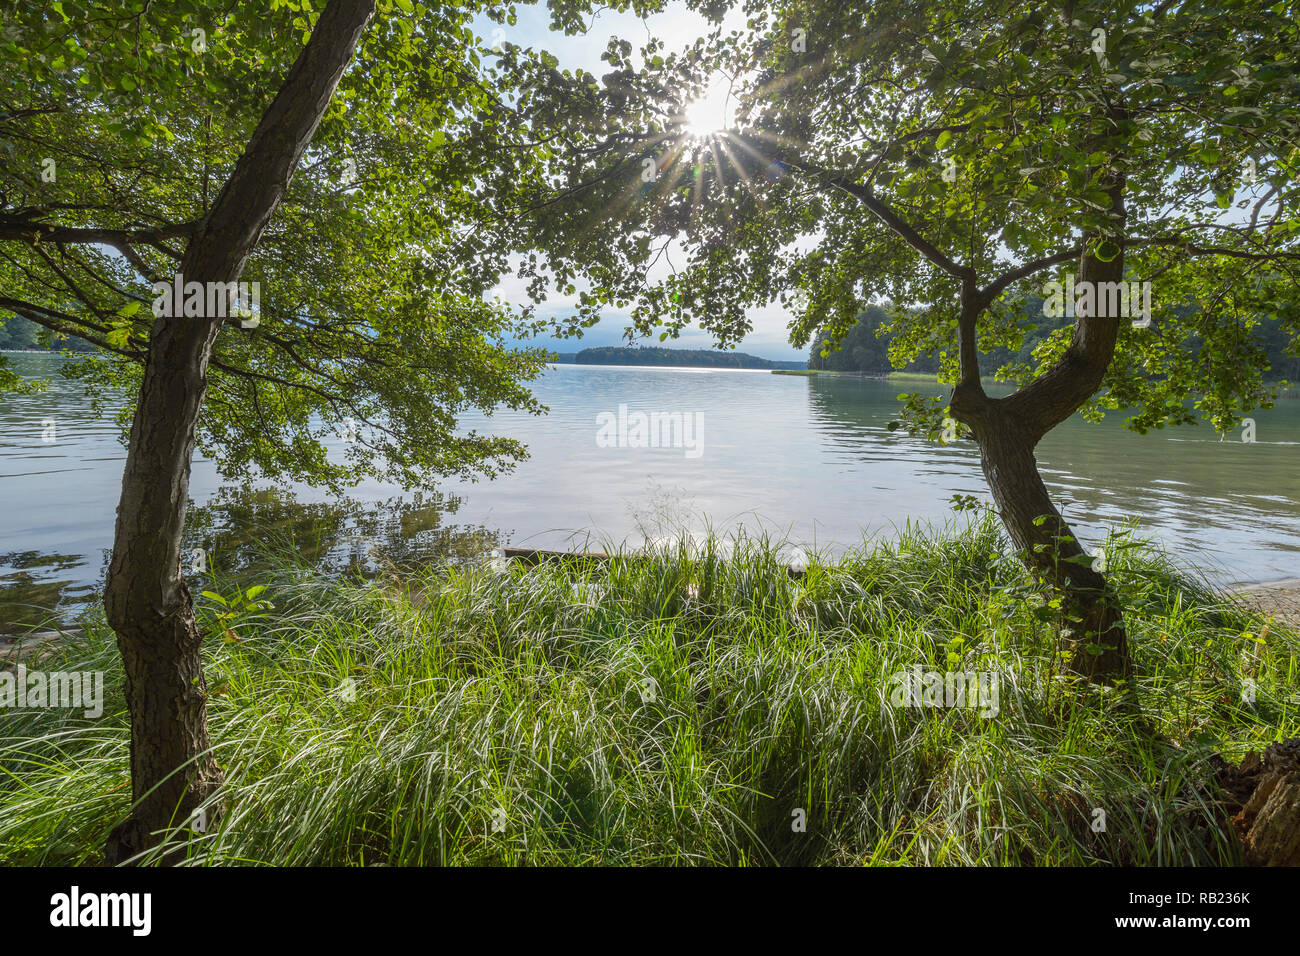 Lakeside in summer, Lake Großer Stechlinsee, Neuglobsow, Rheinsberg, Ruppiner Land, Brandenburg, Germany - Stock Image